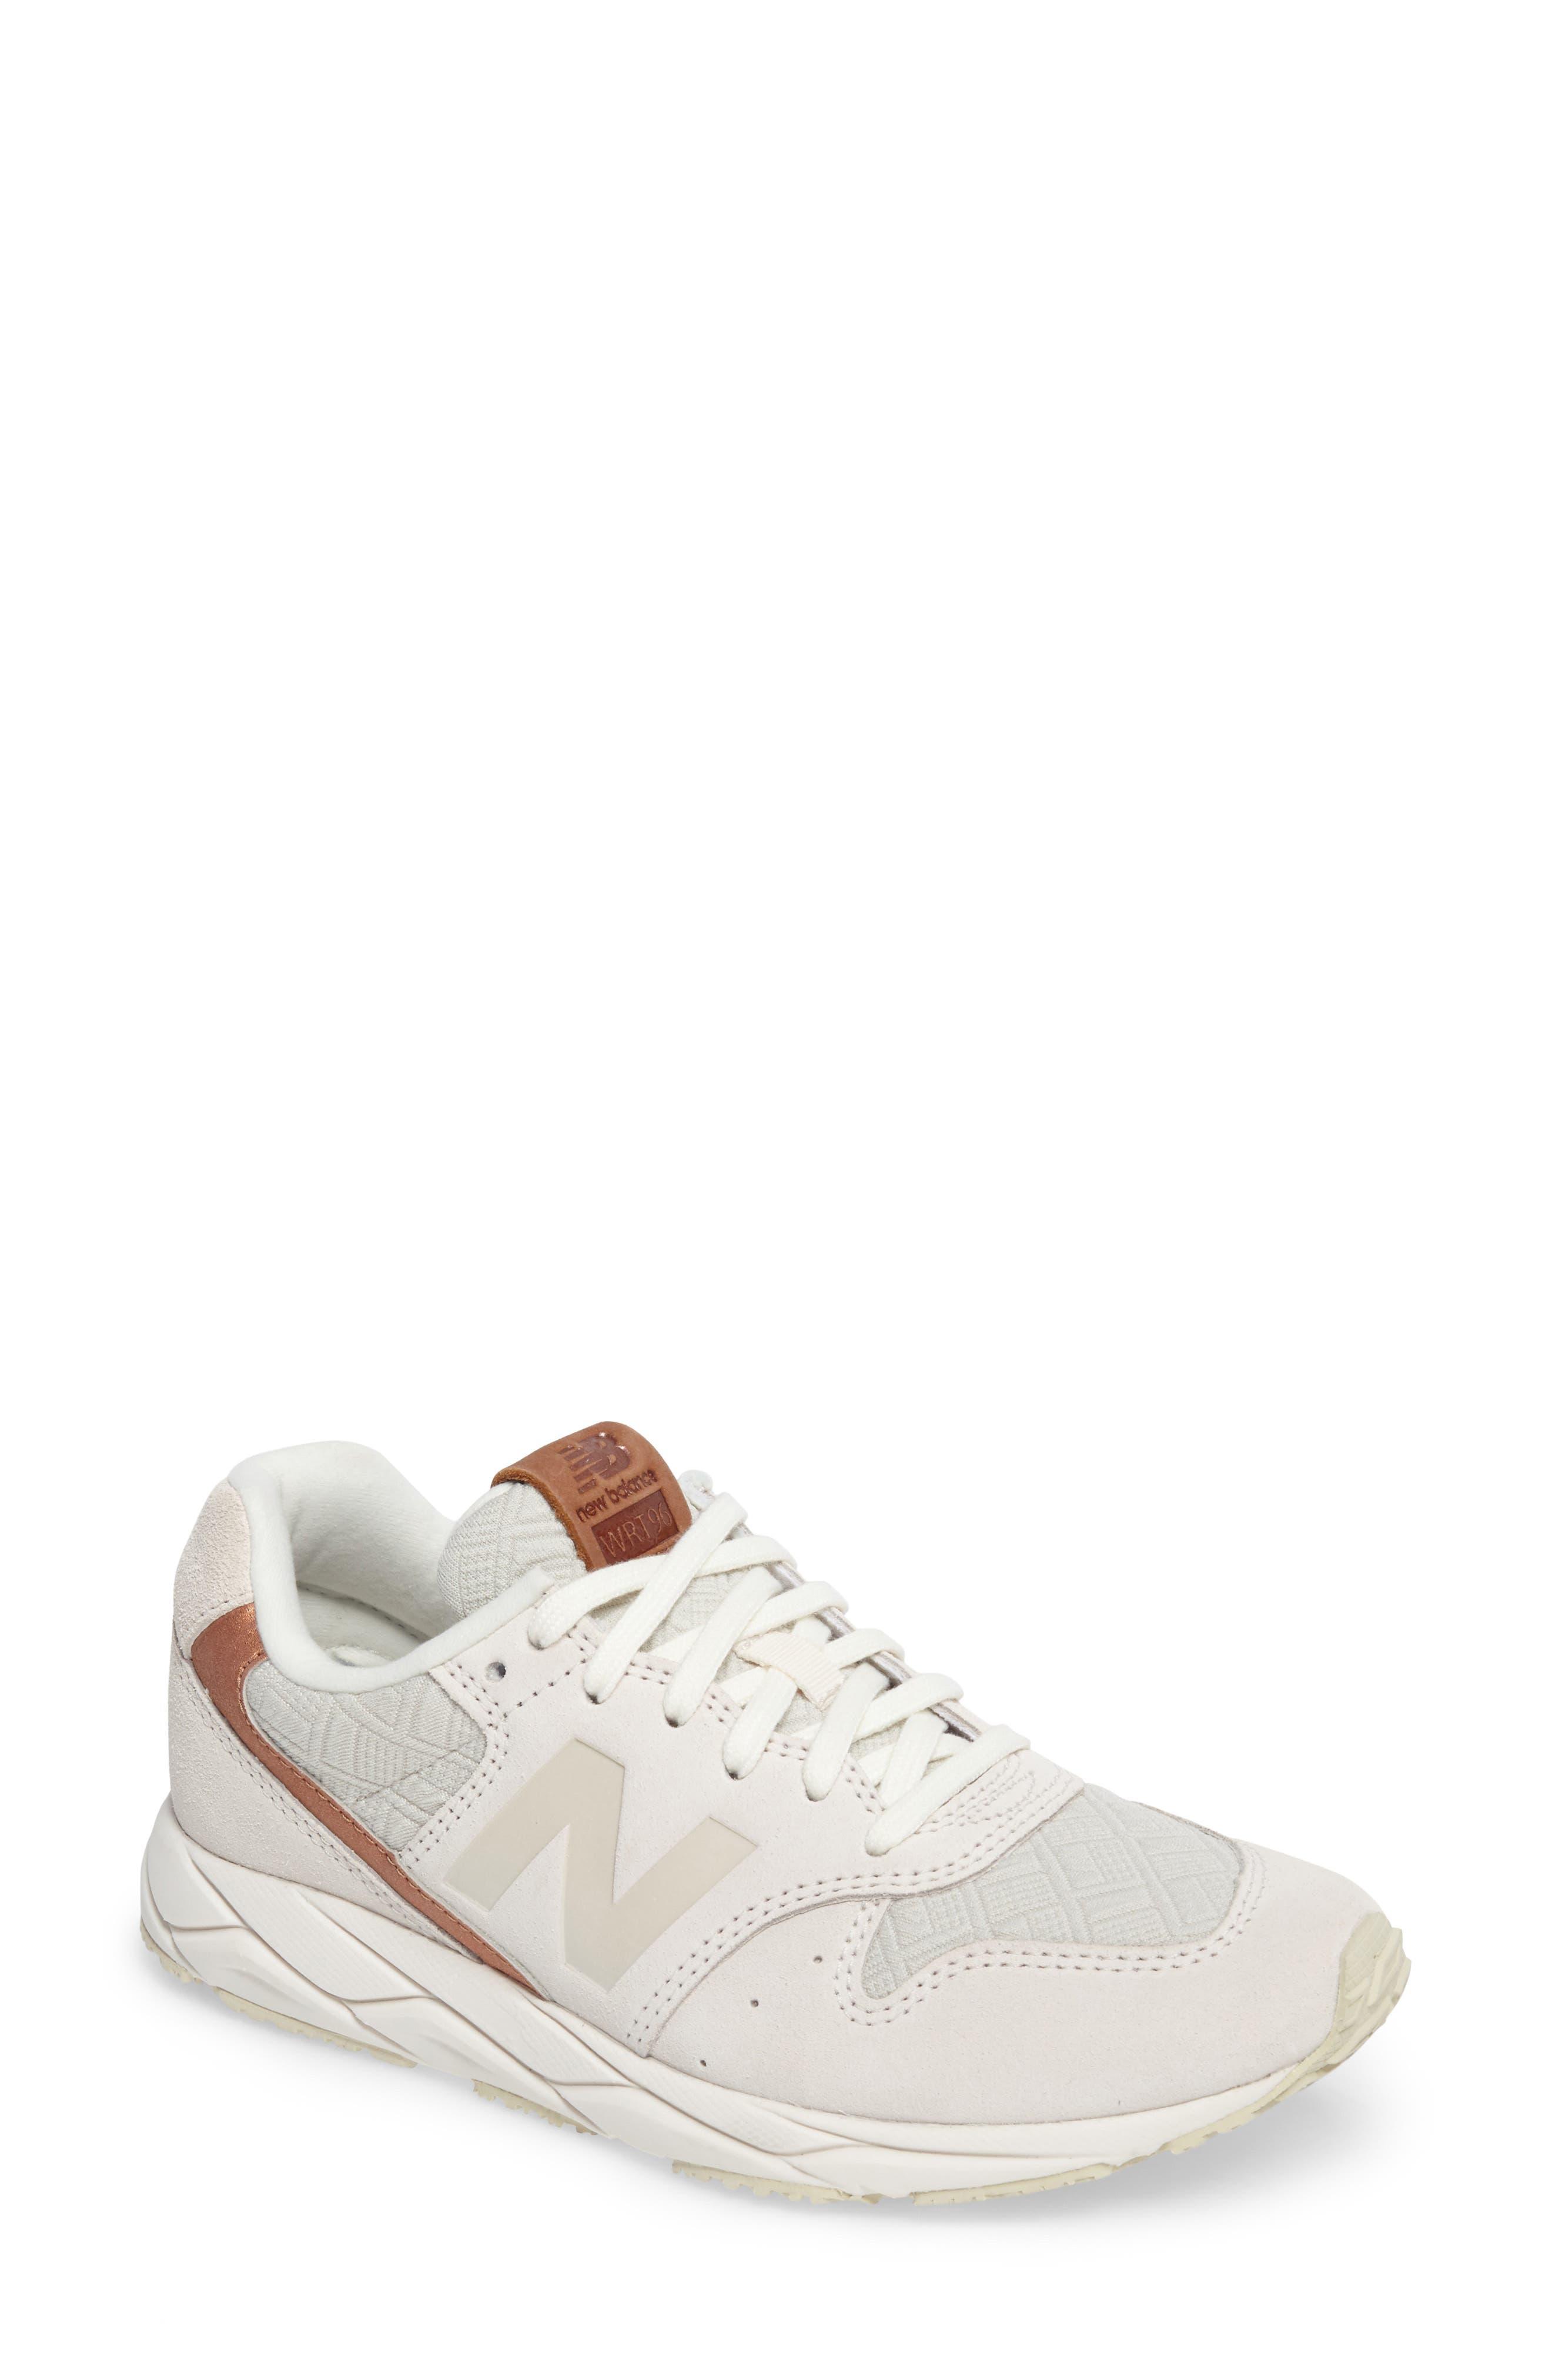 96 Mash-Up Sneaker,                         Main,                         color,